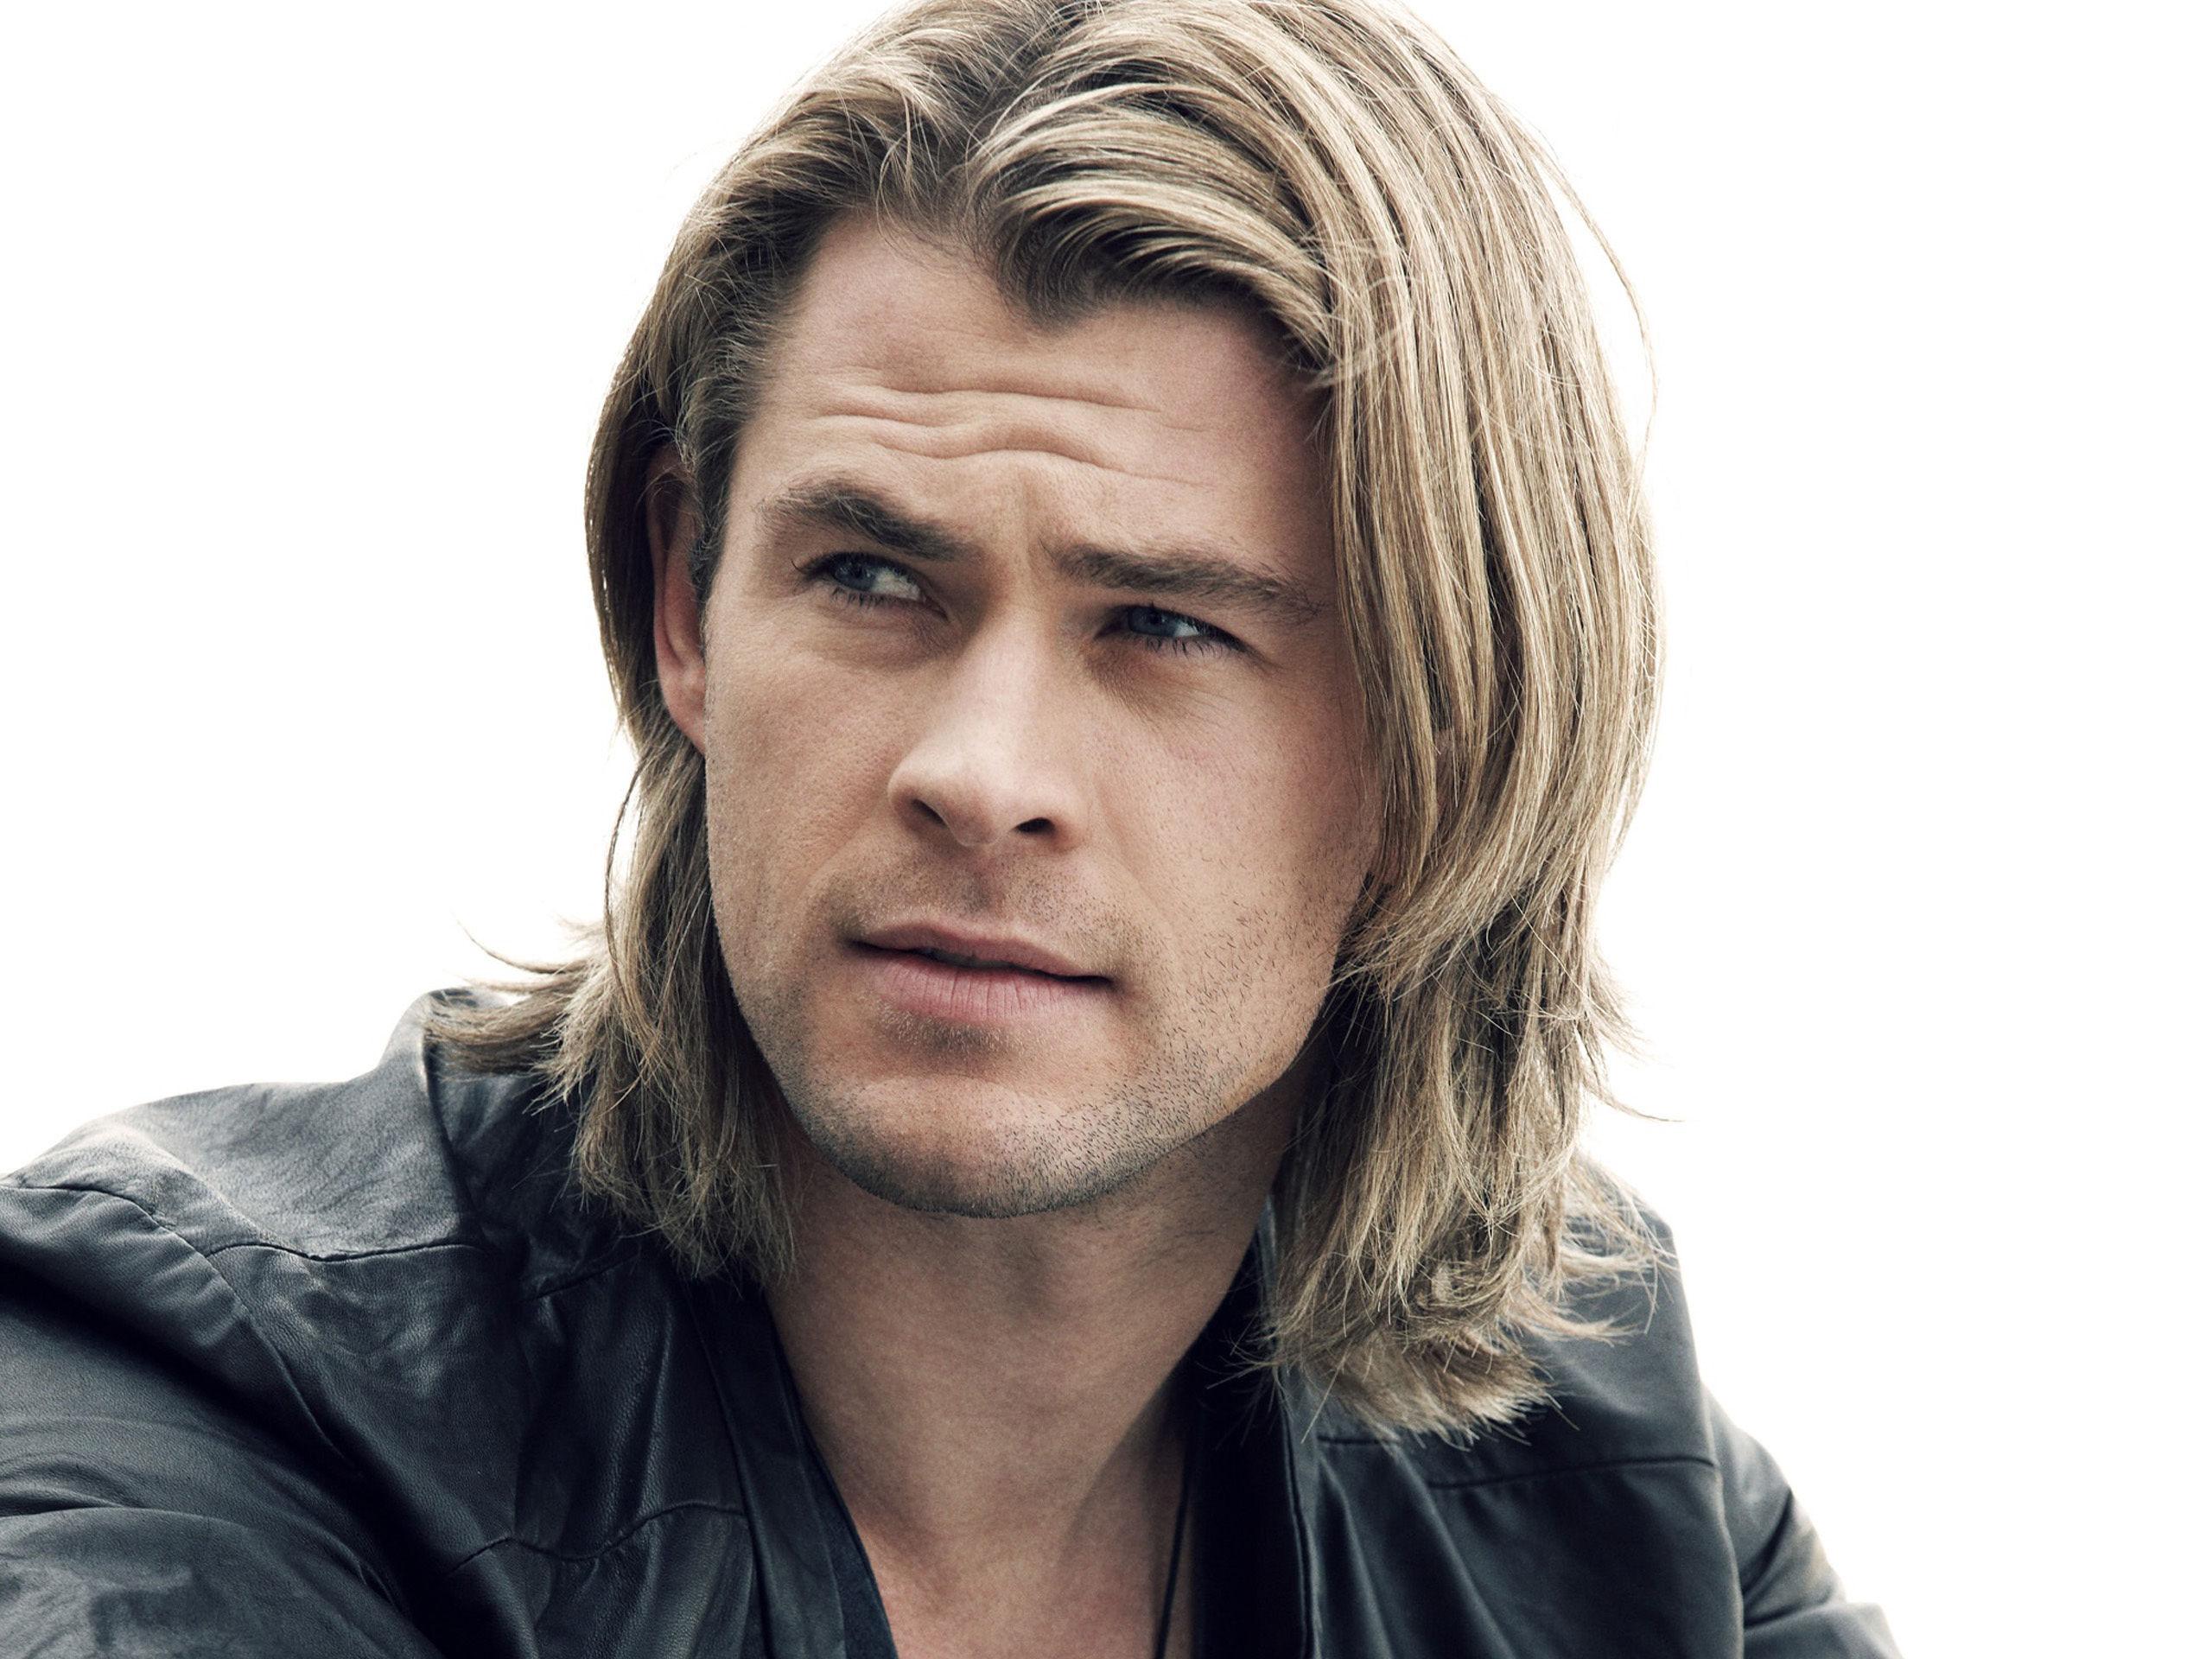 Chris Hemsworth Widescreen